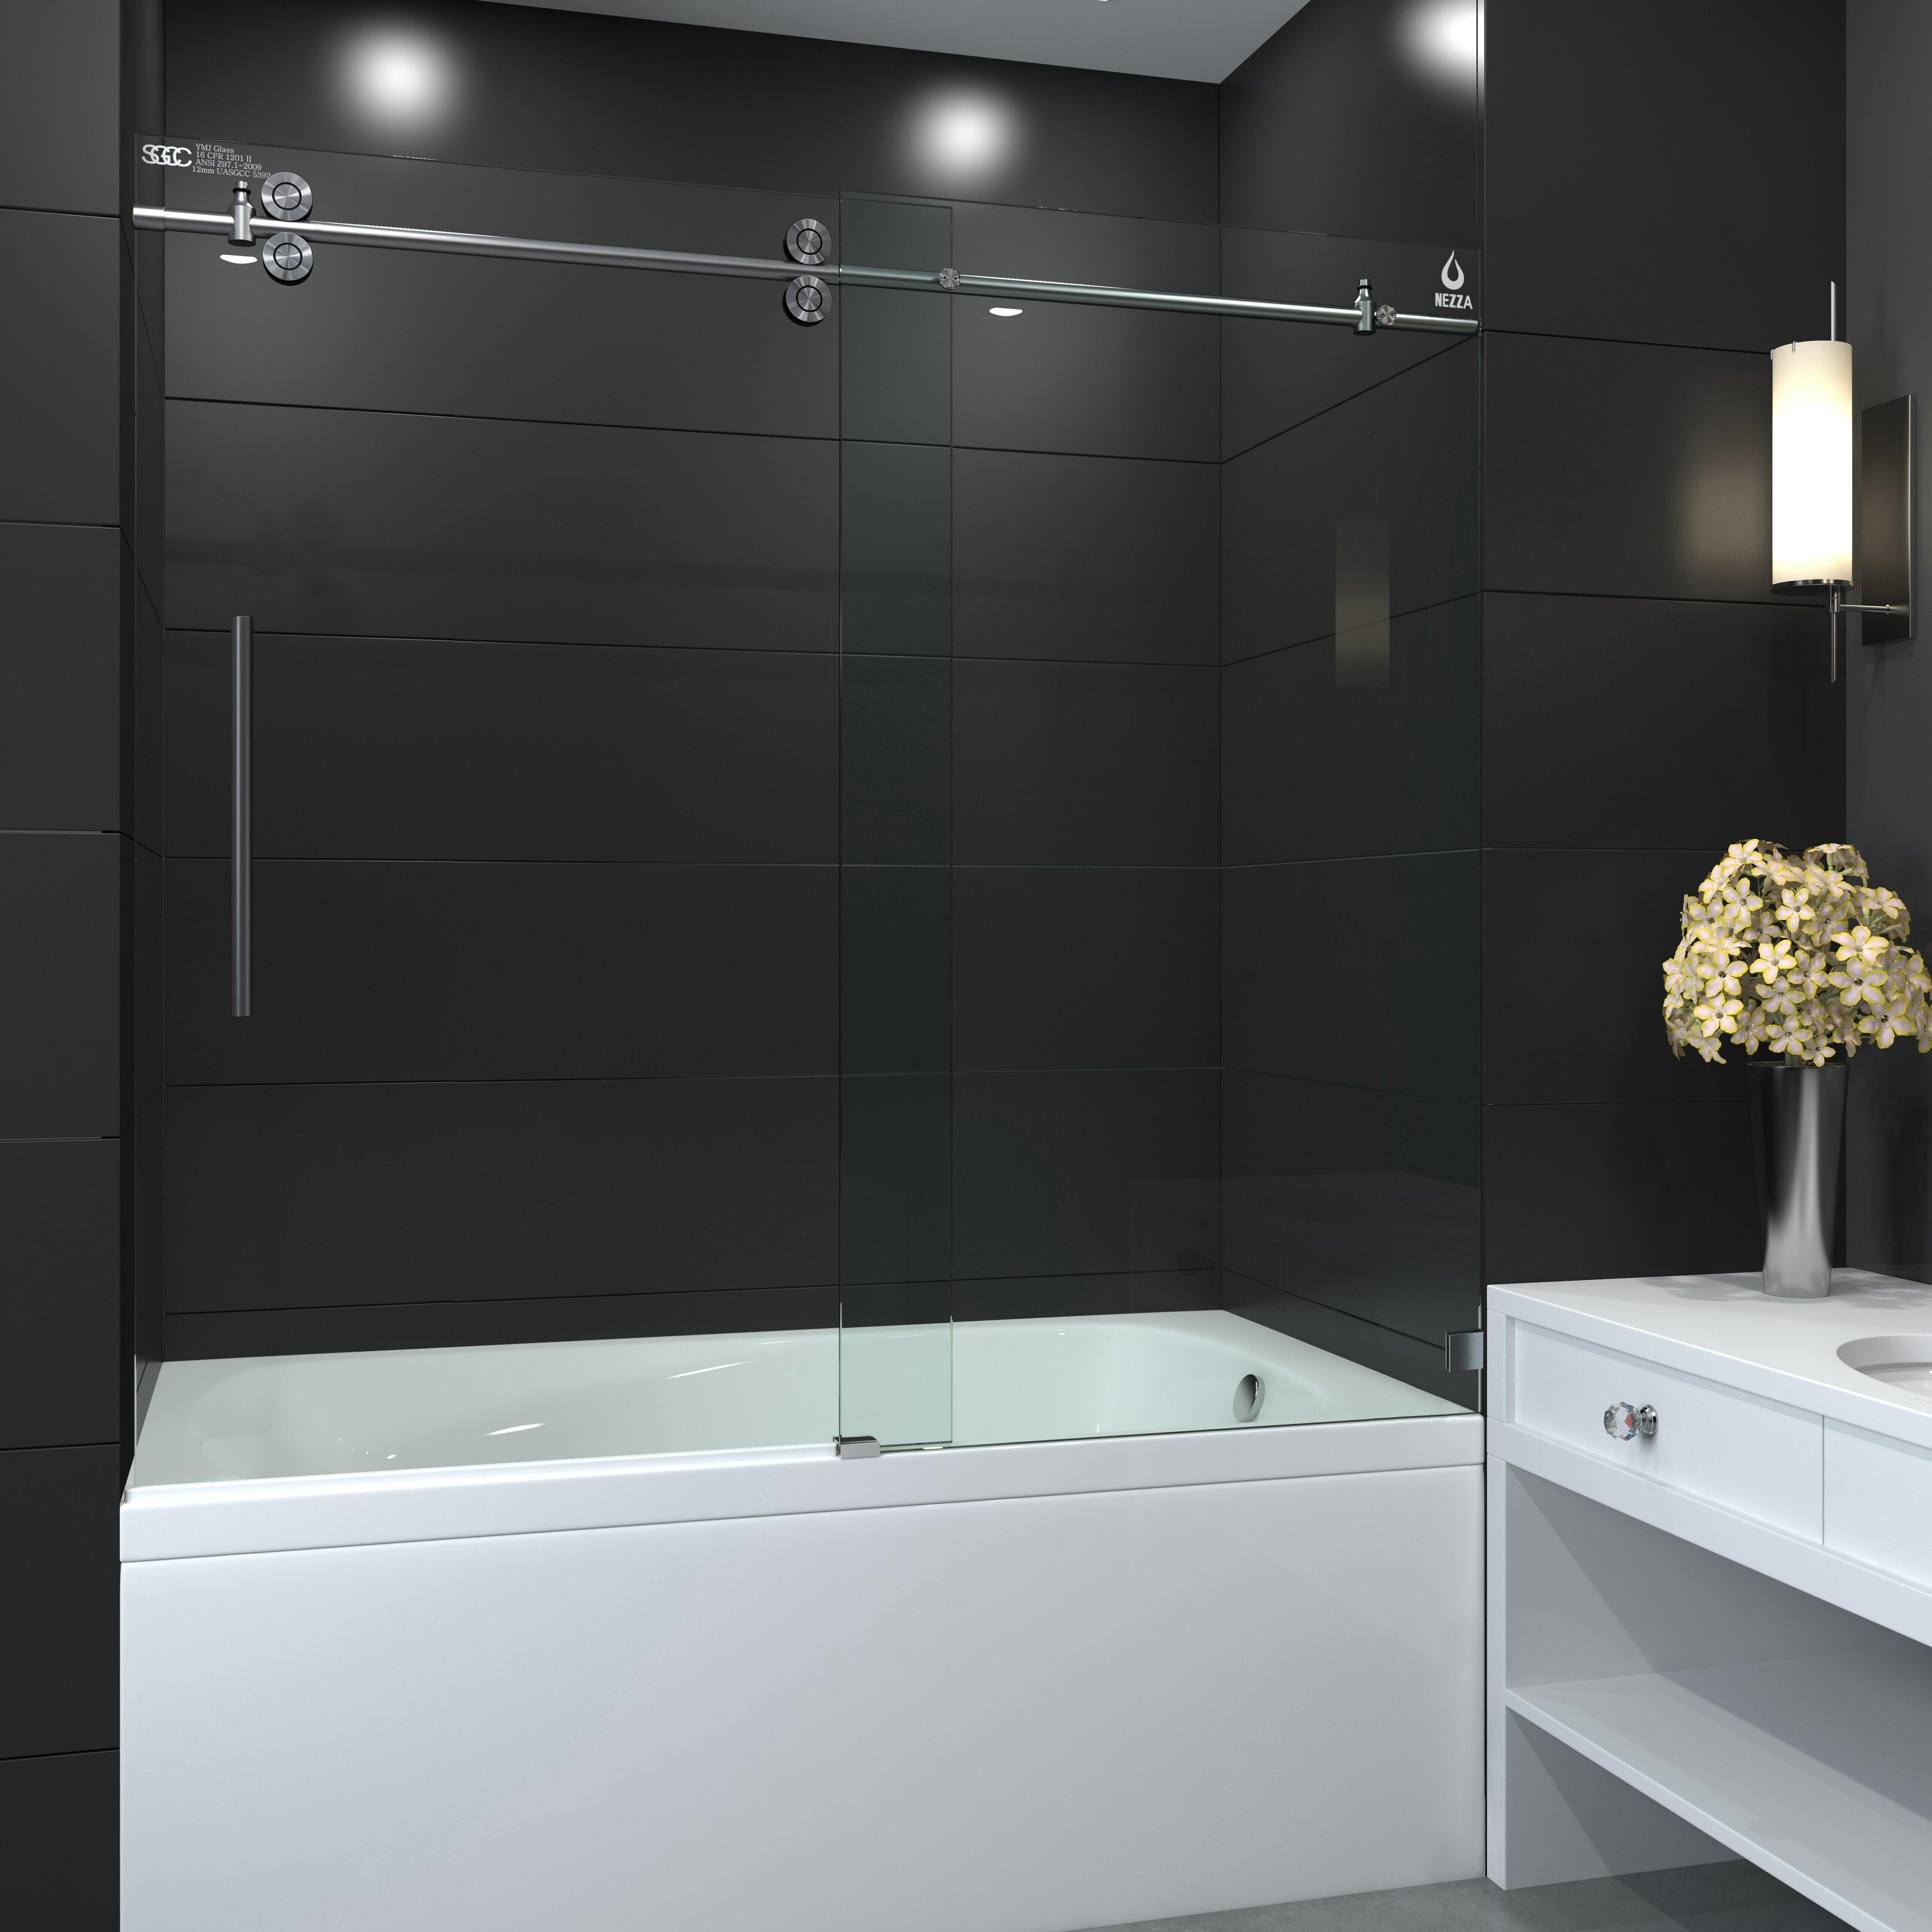 Nezza Galaxy Series 60 X 66 Single Sliding Tub Shower Door